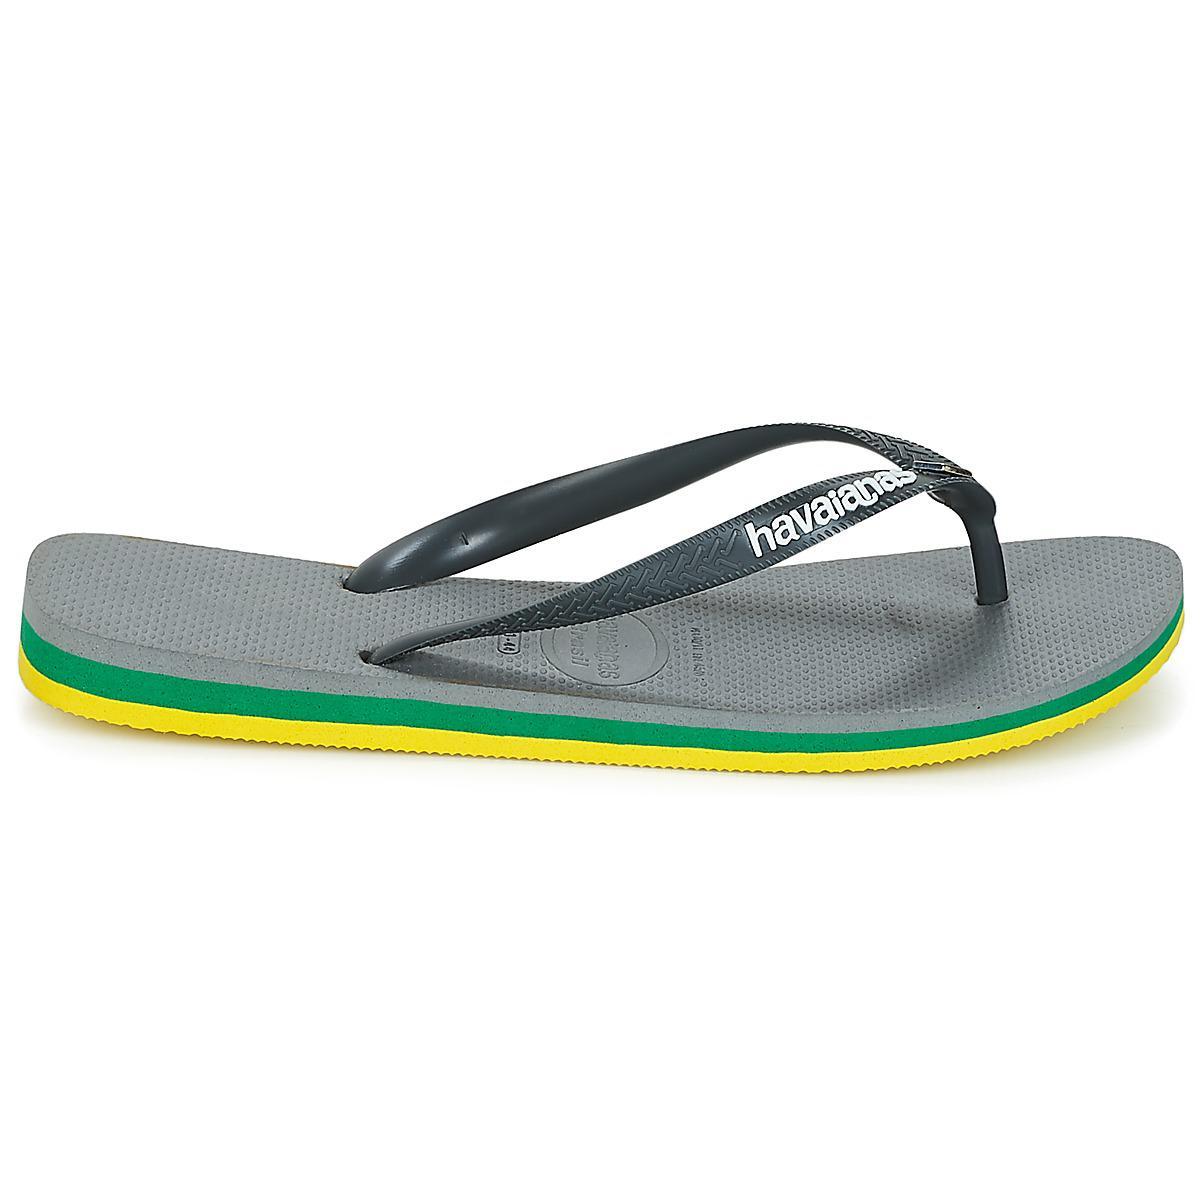 f145a91d9b33 Havaianas Brasil Layers Men s Flip Flops   Sandals (shoes) In Grey ...